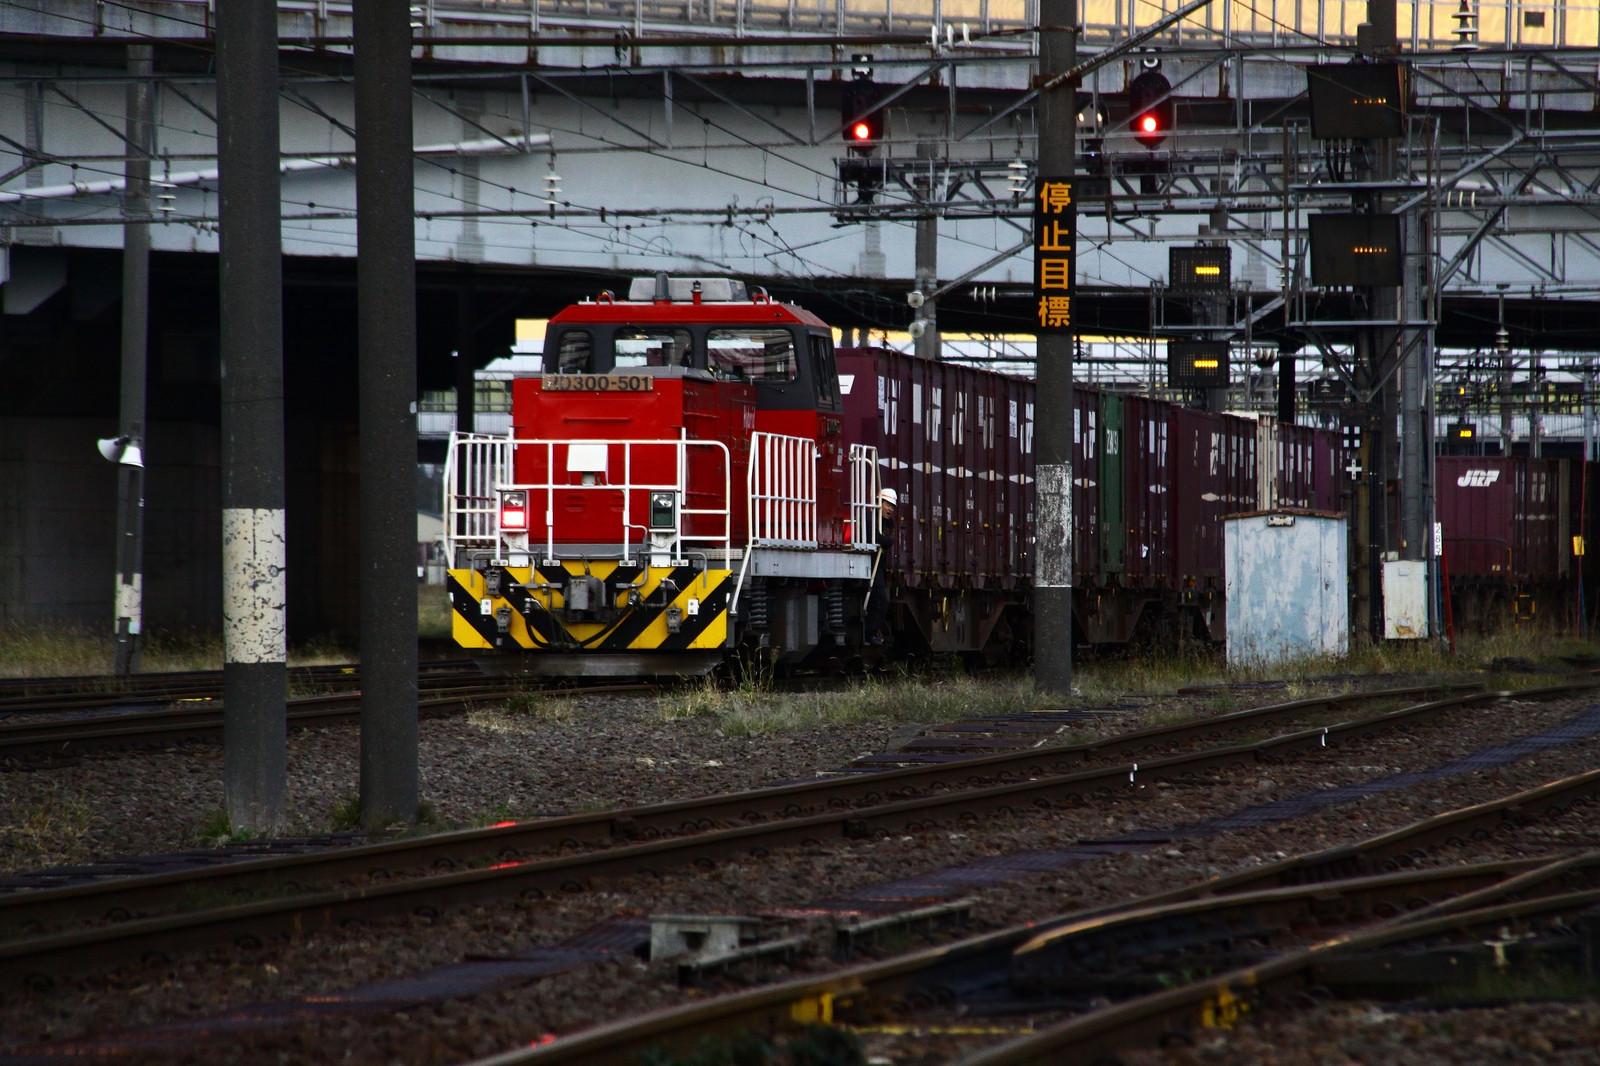 Jr1510121002